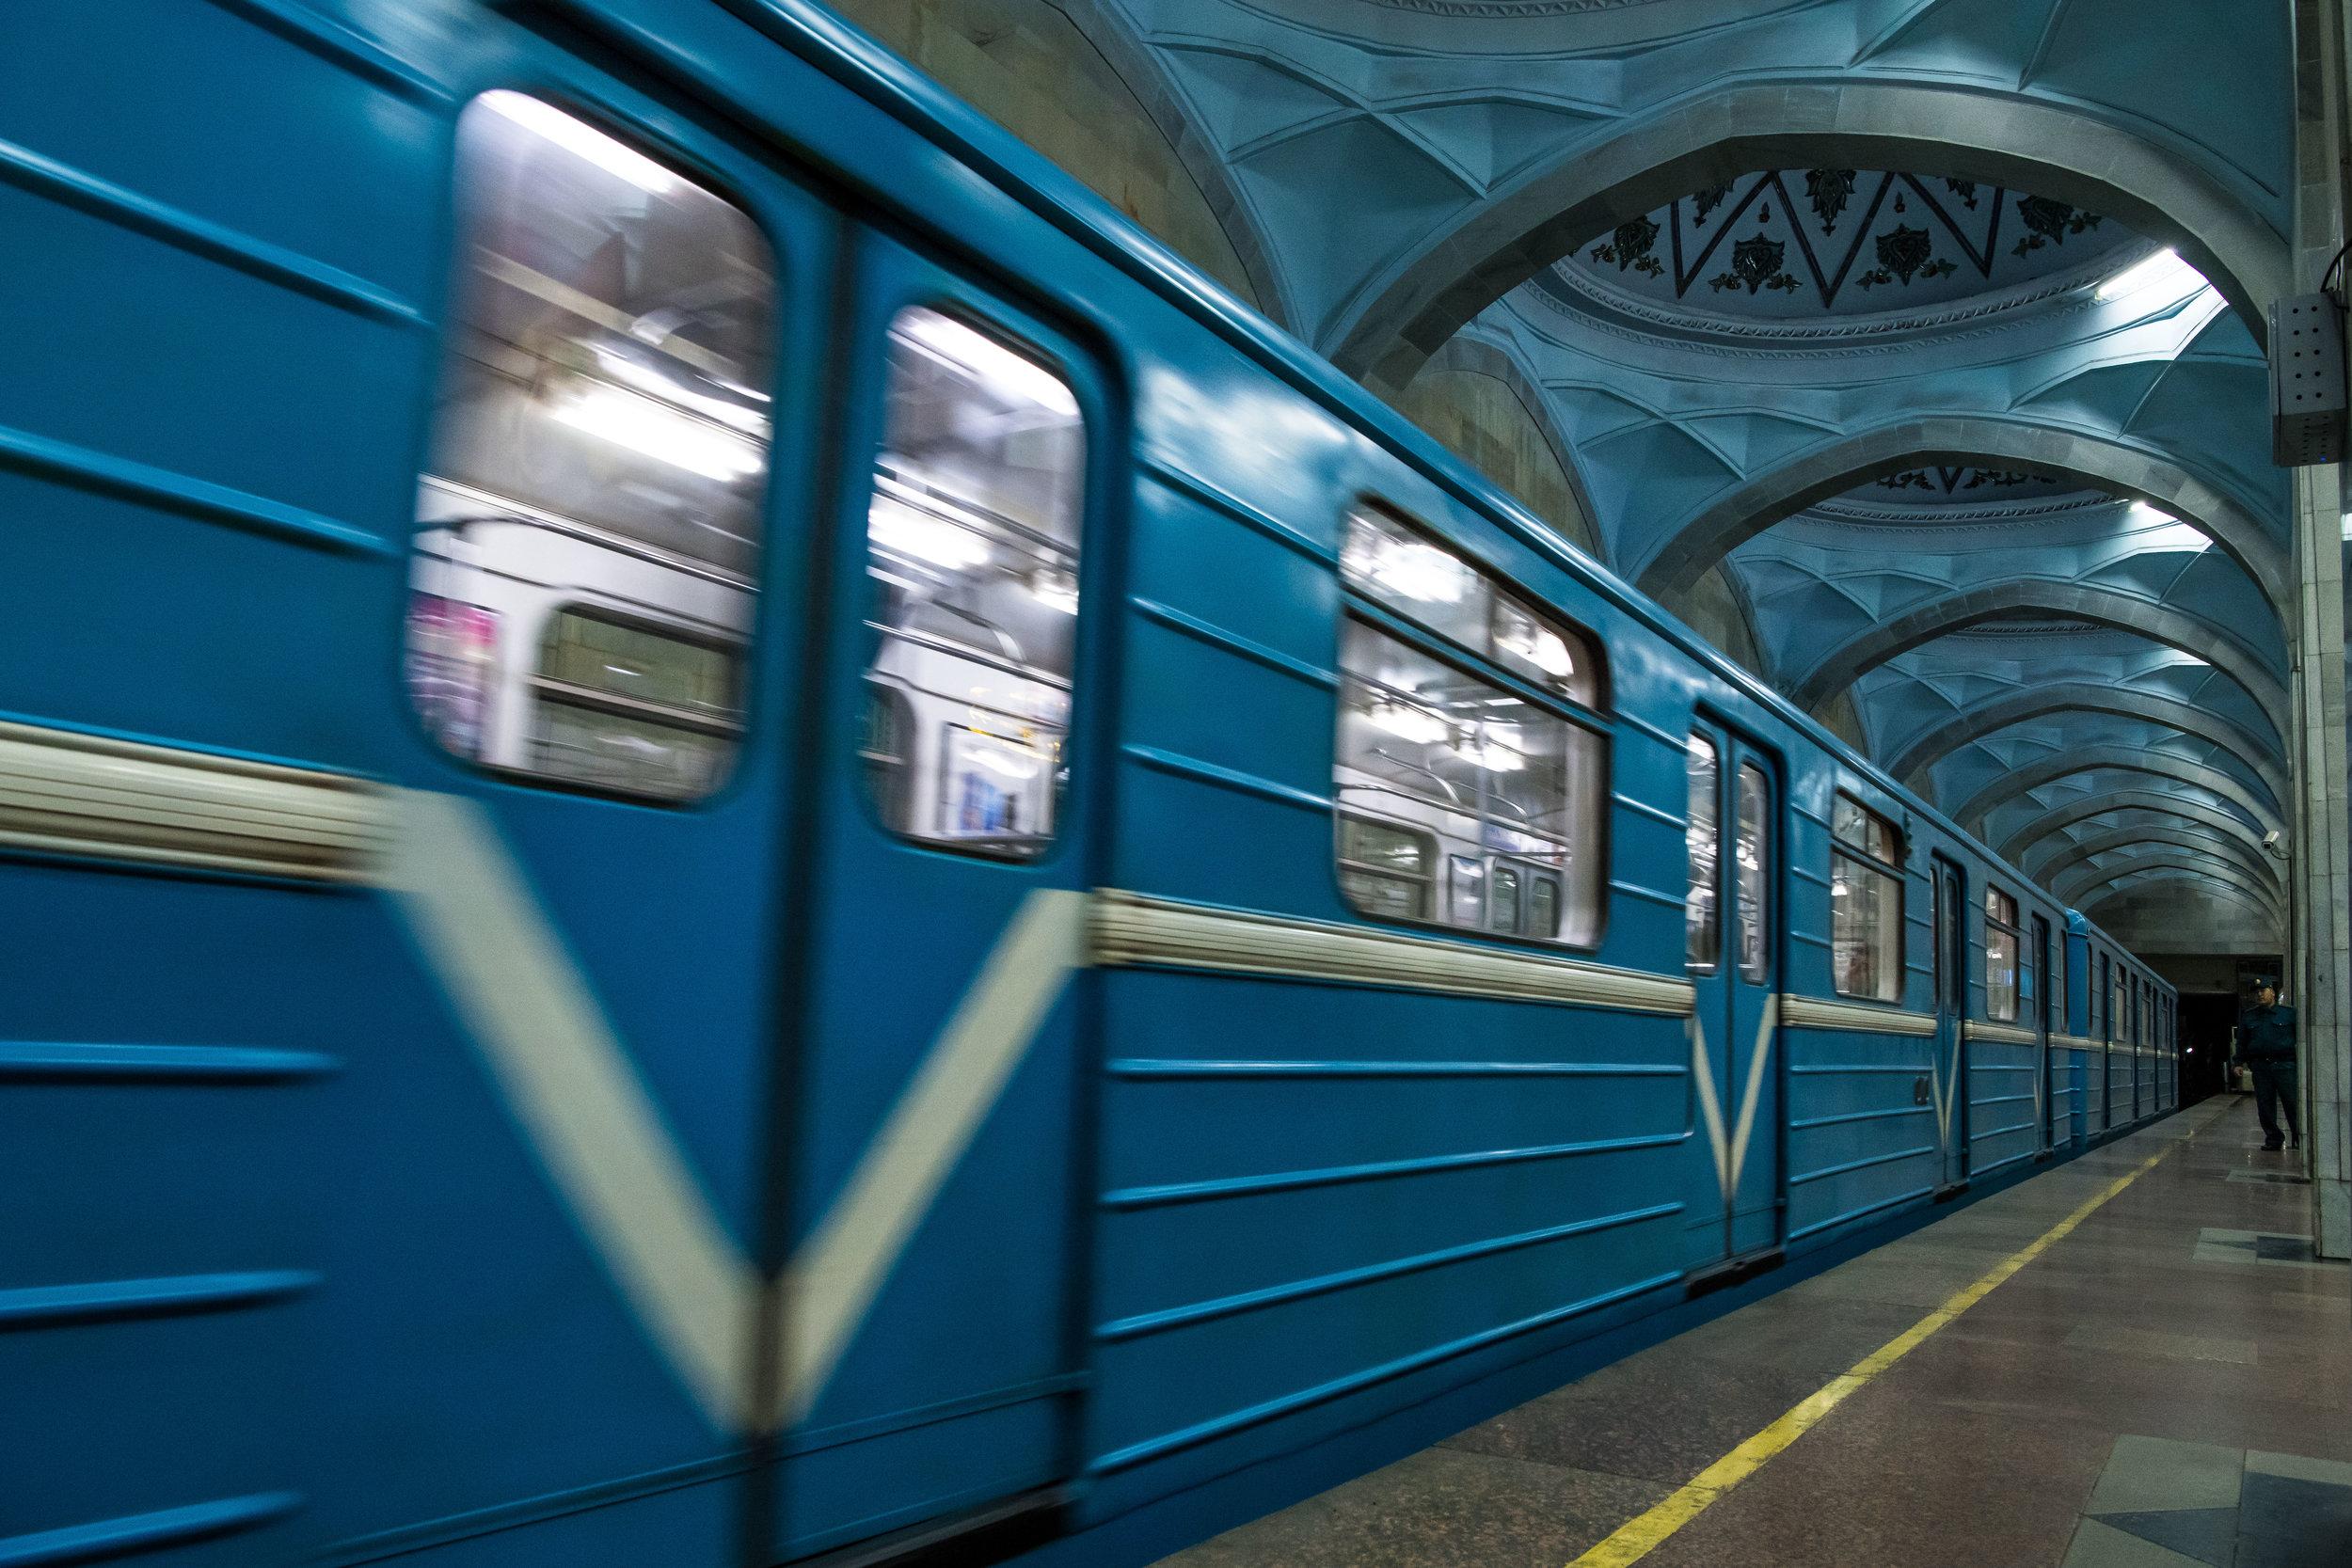 Tashkent-6260.jpg